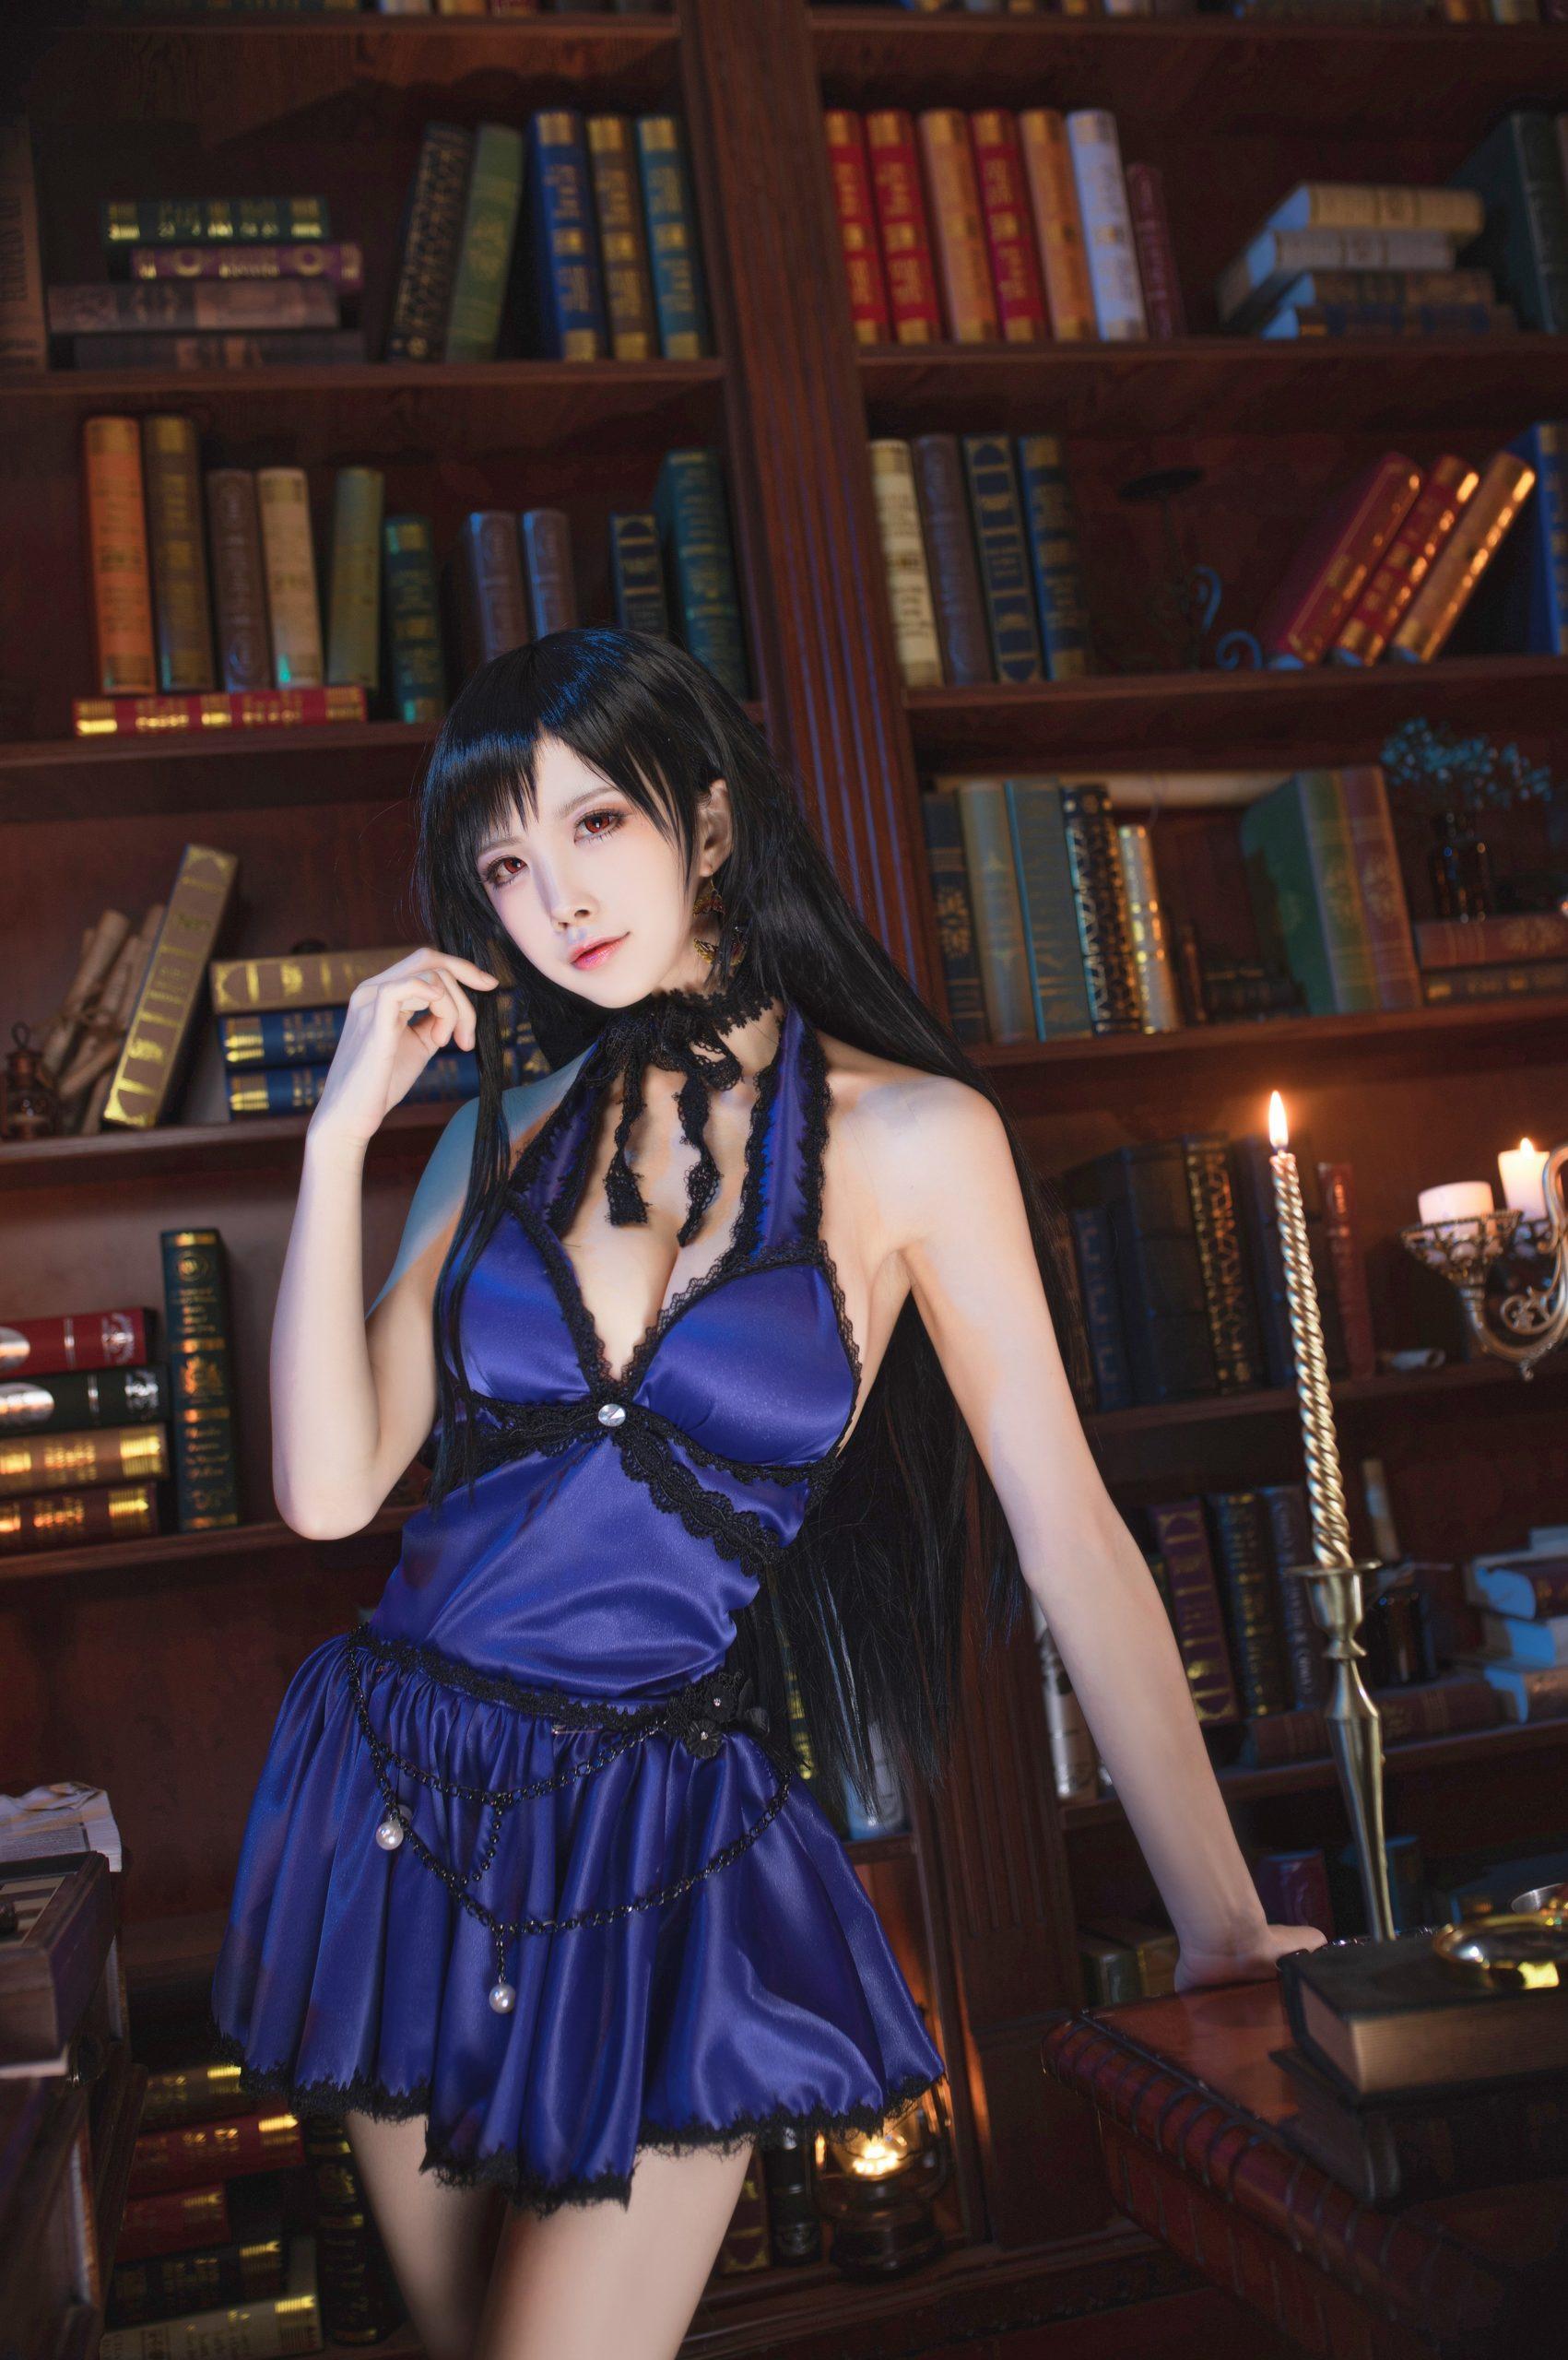 Final Fantasy VII Tifa Lockhart Night Dress Cosplay by Aqua Quite Inviting 16